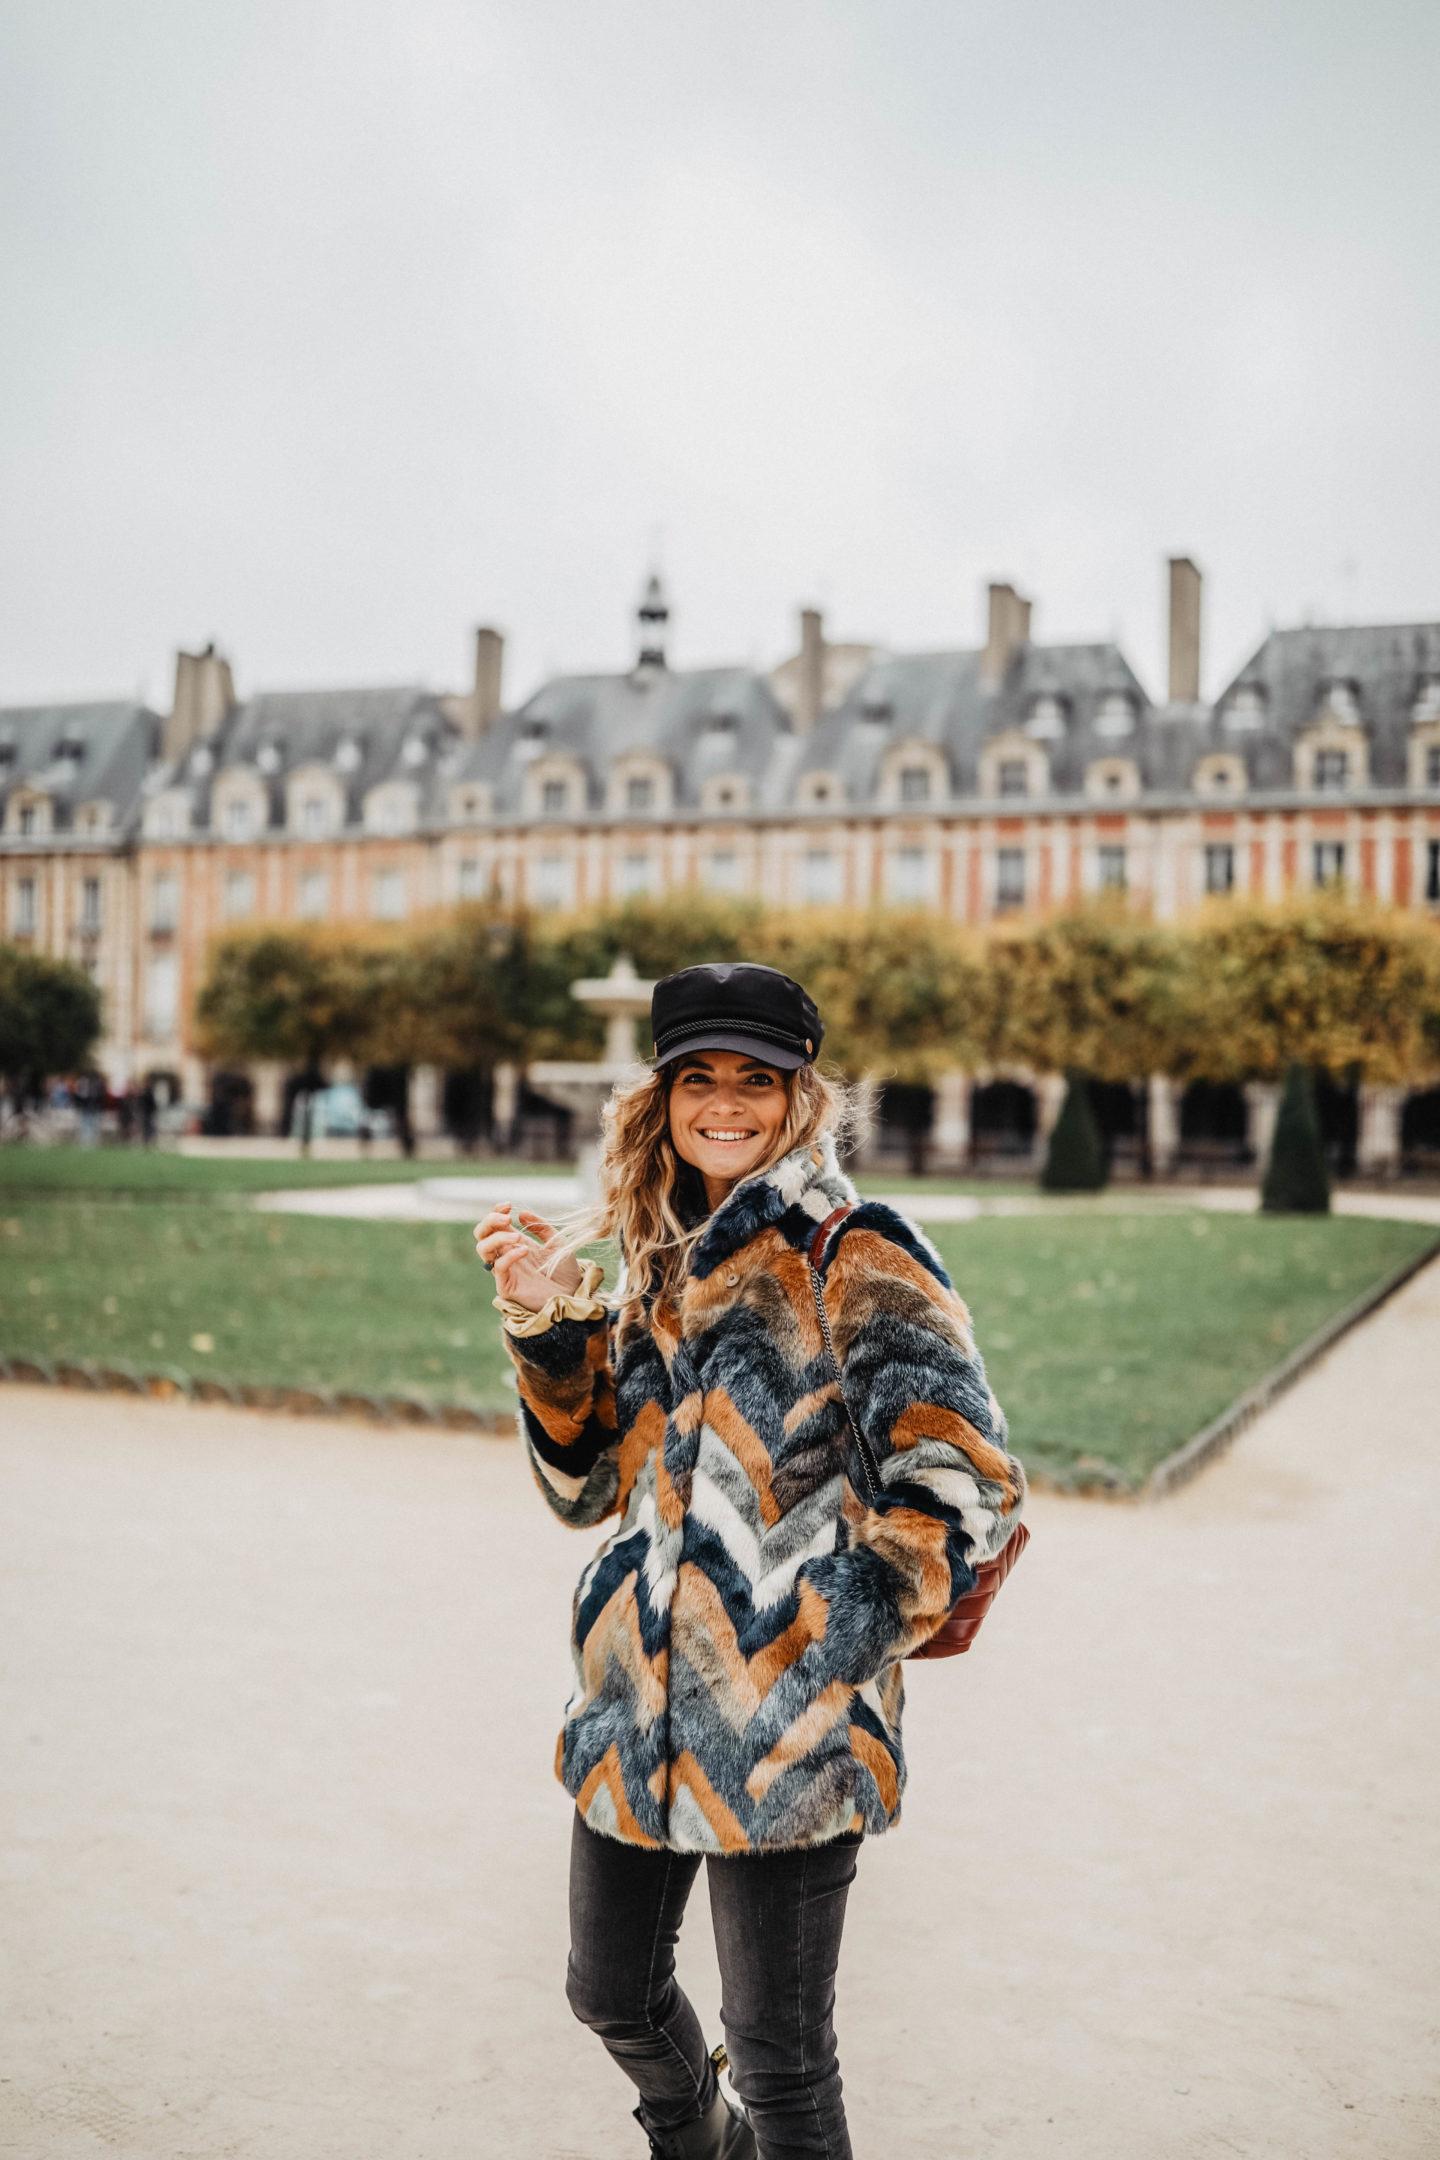 Tendance manteau en fausse fourrure marie and mood  blog